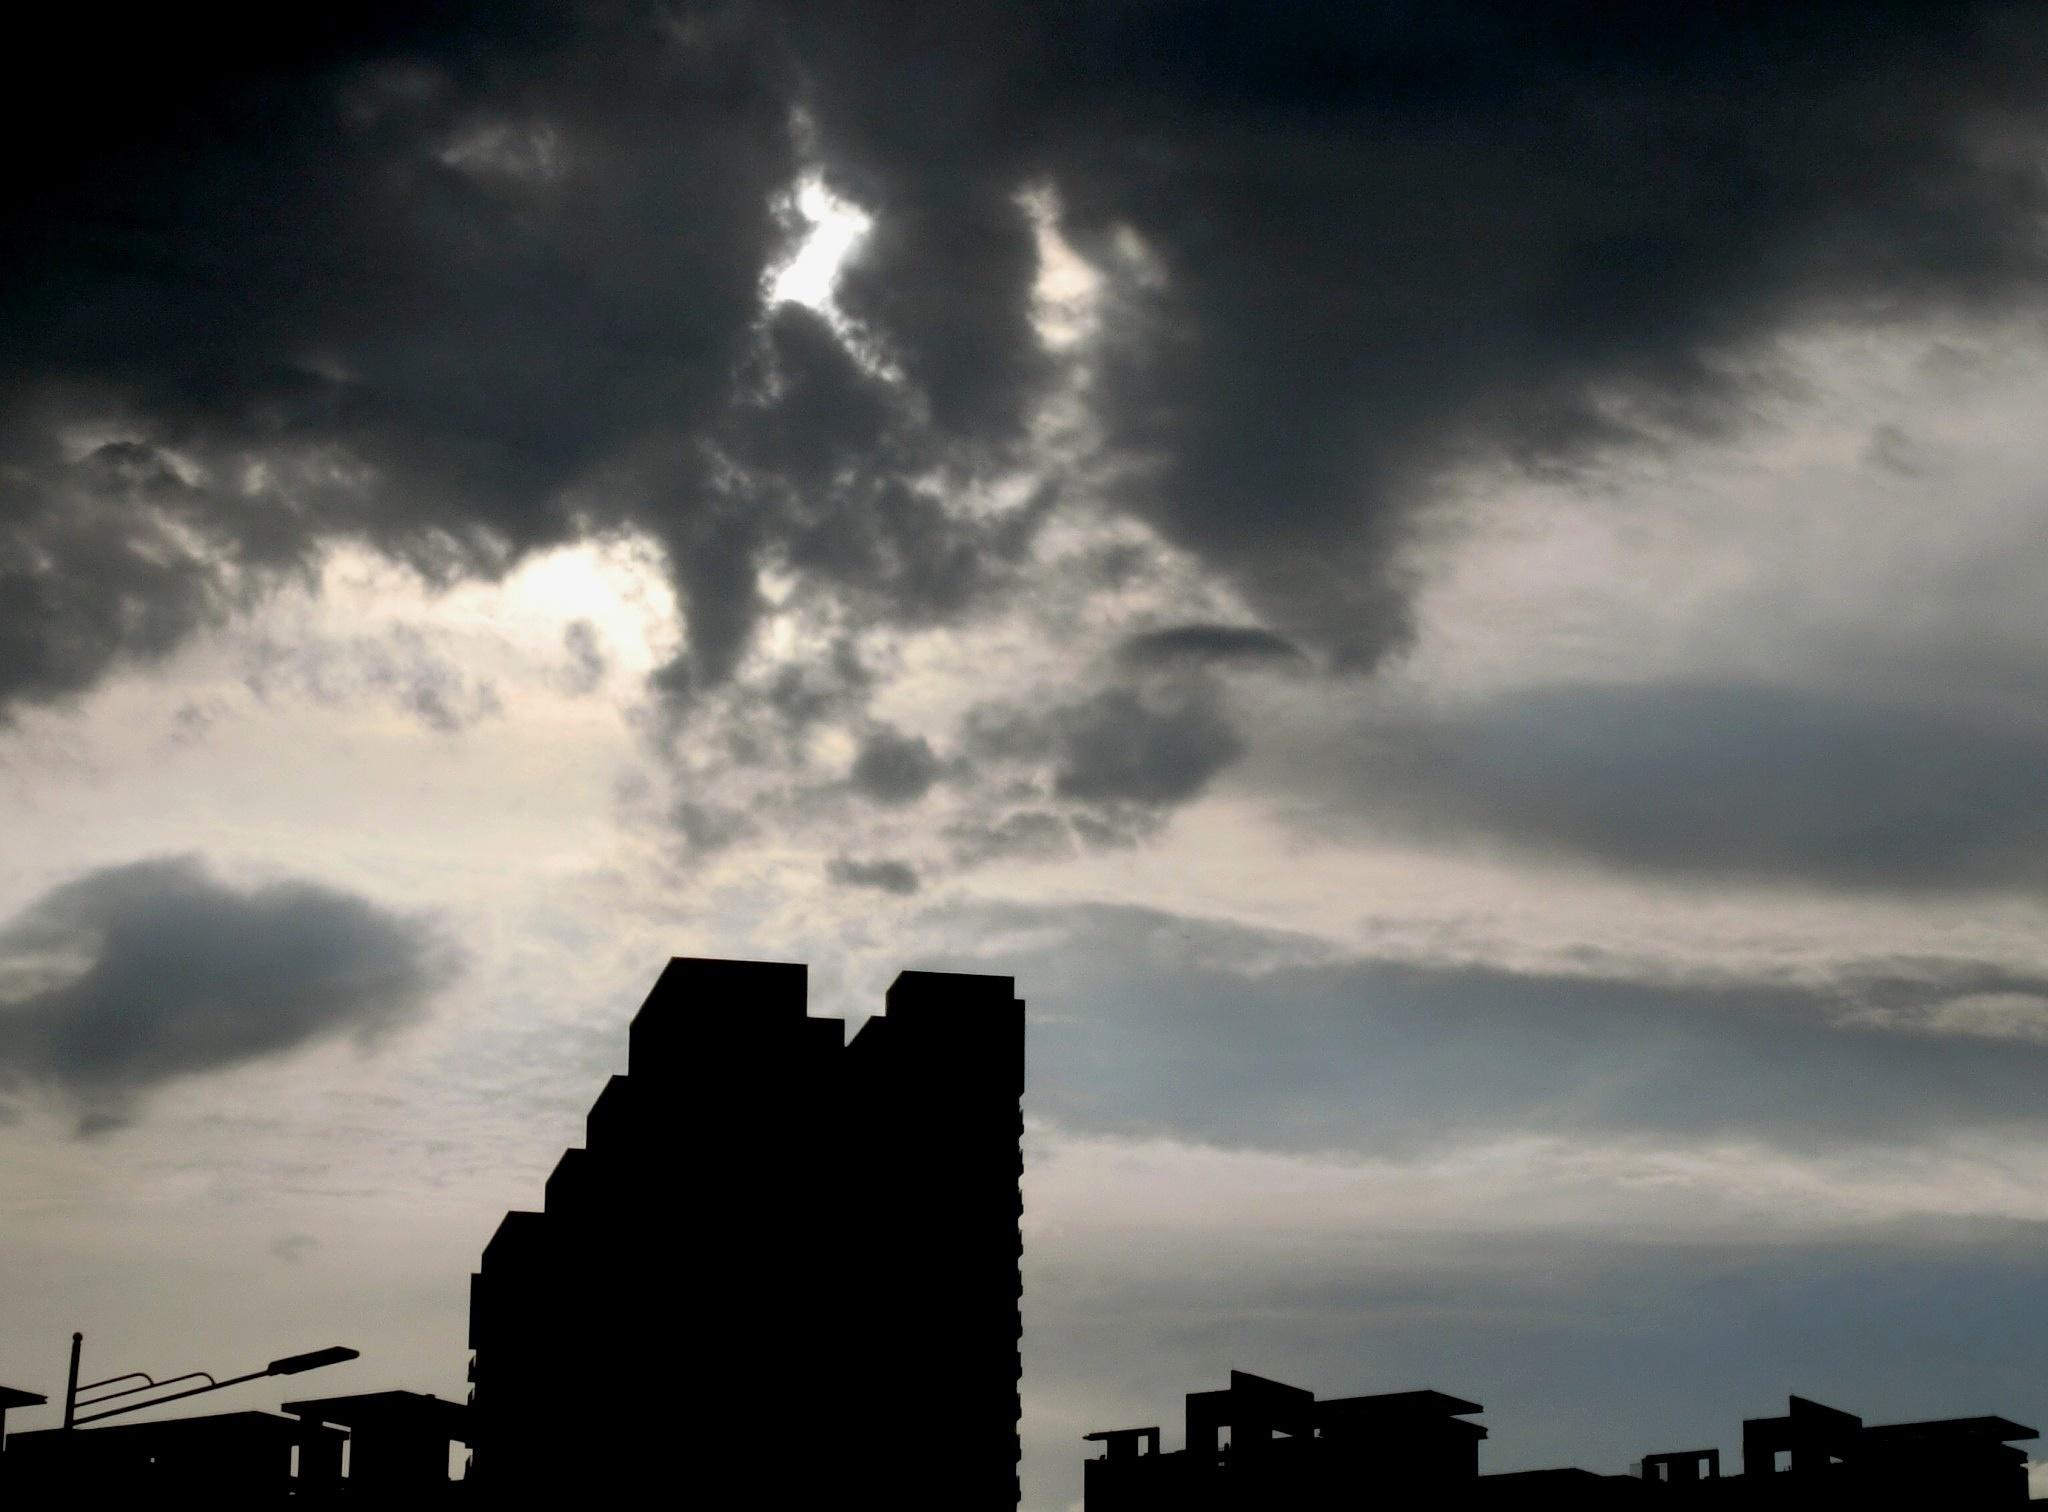 Mystic clouds (2 ladies dancing), Lian Nan by pop88123